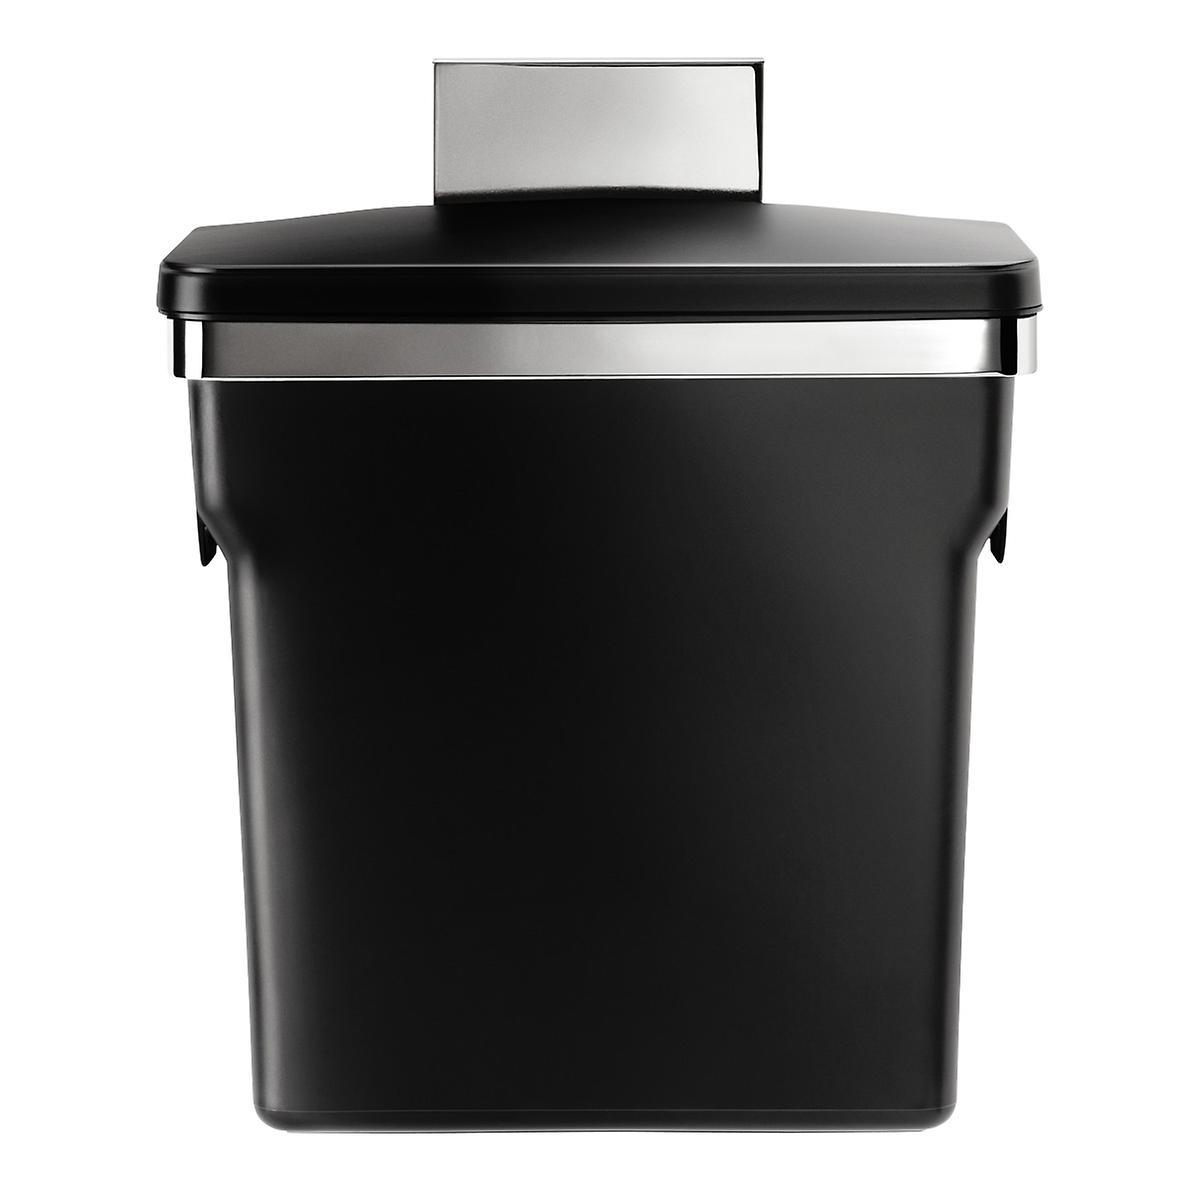 simplehuman Black In-Cabinet 2.6 gal. Trash Can